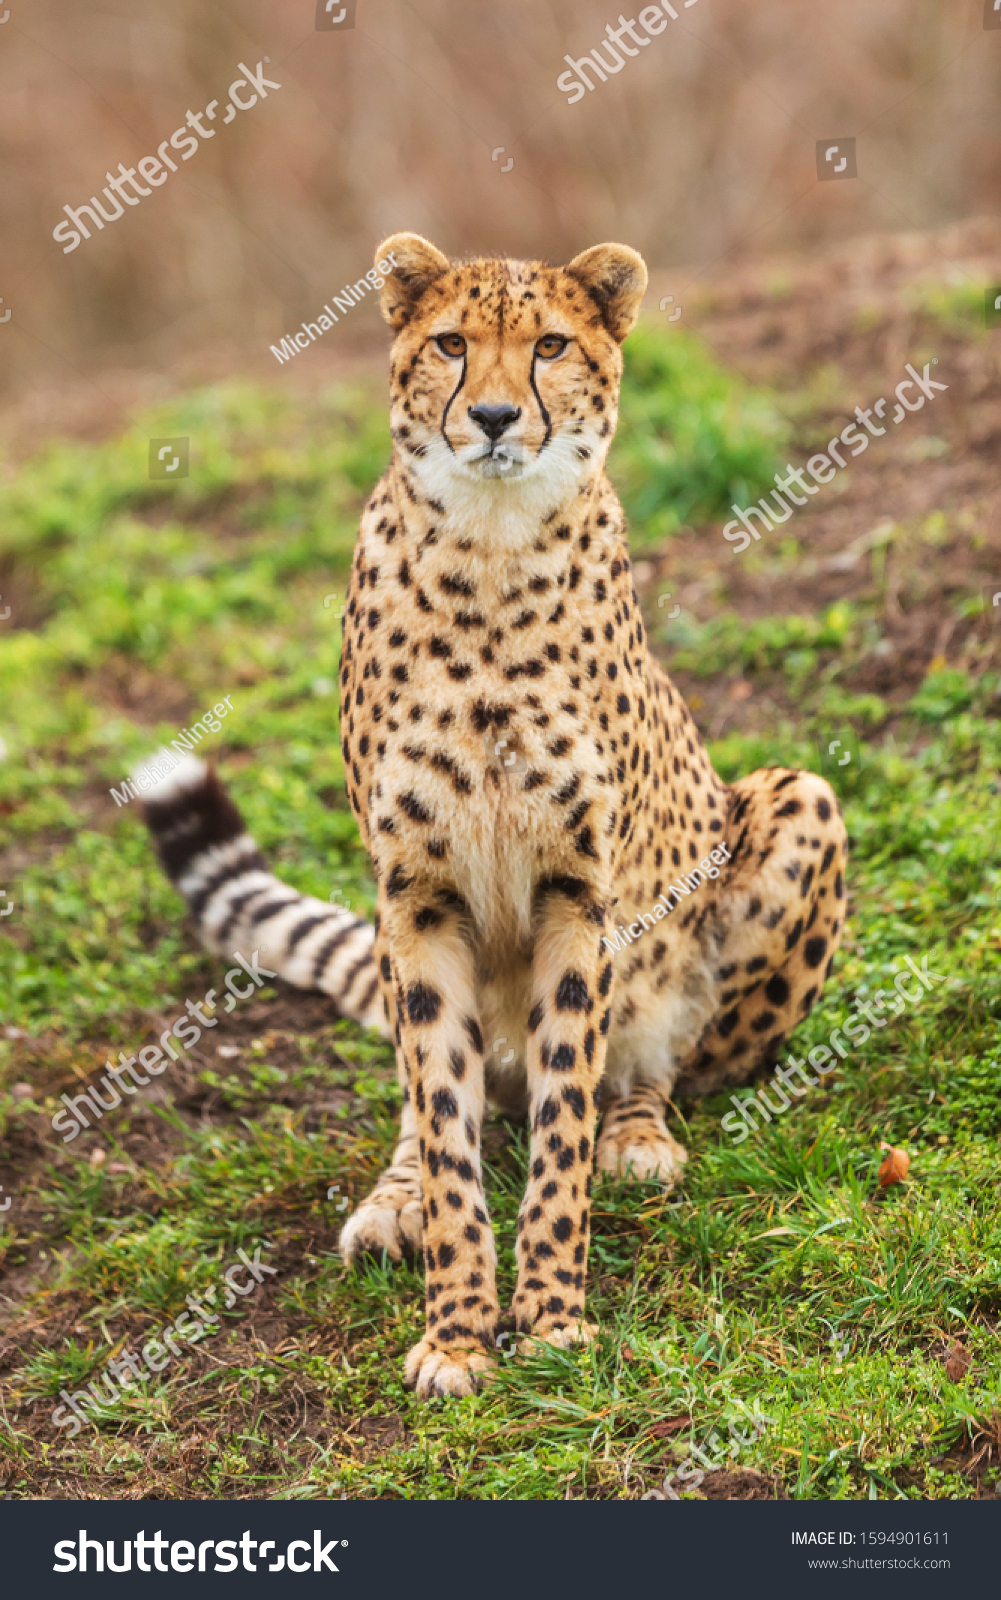 cheetah (Acinonyx jubatus) is sitting